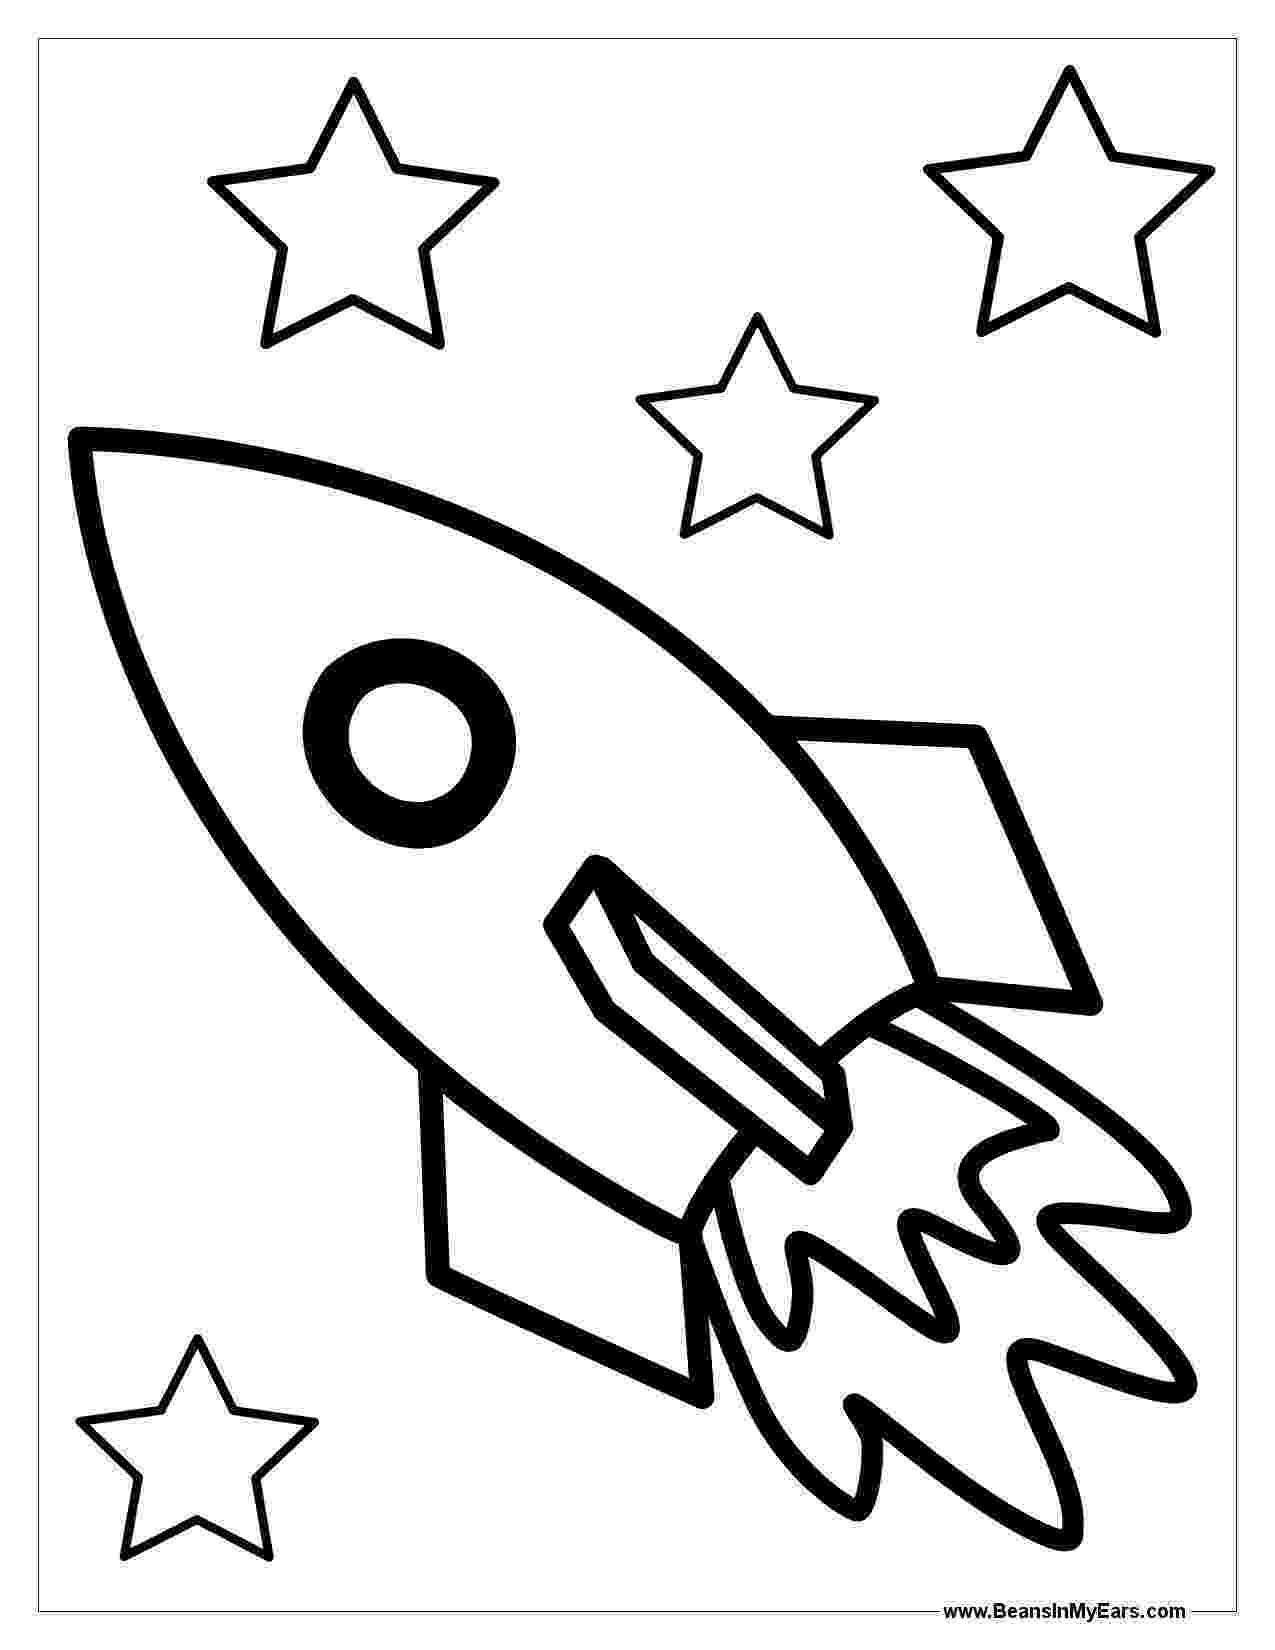 rocket ship coloring page rocket ship entering space coloring page download ship rocket coloring page